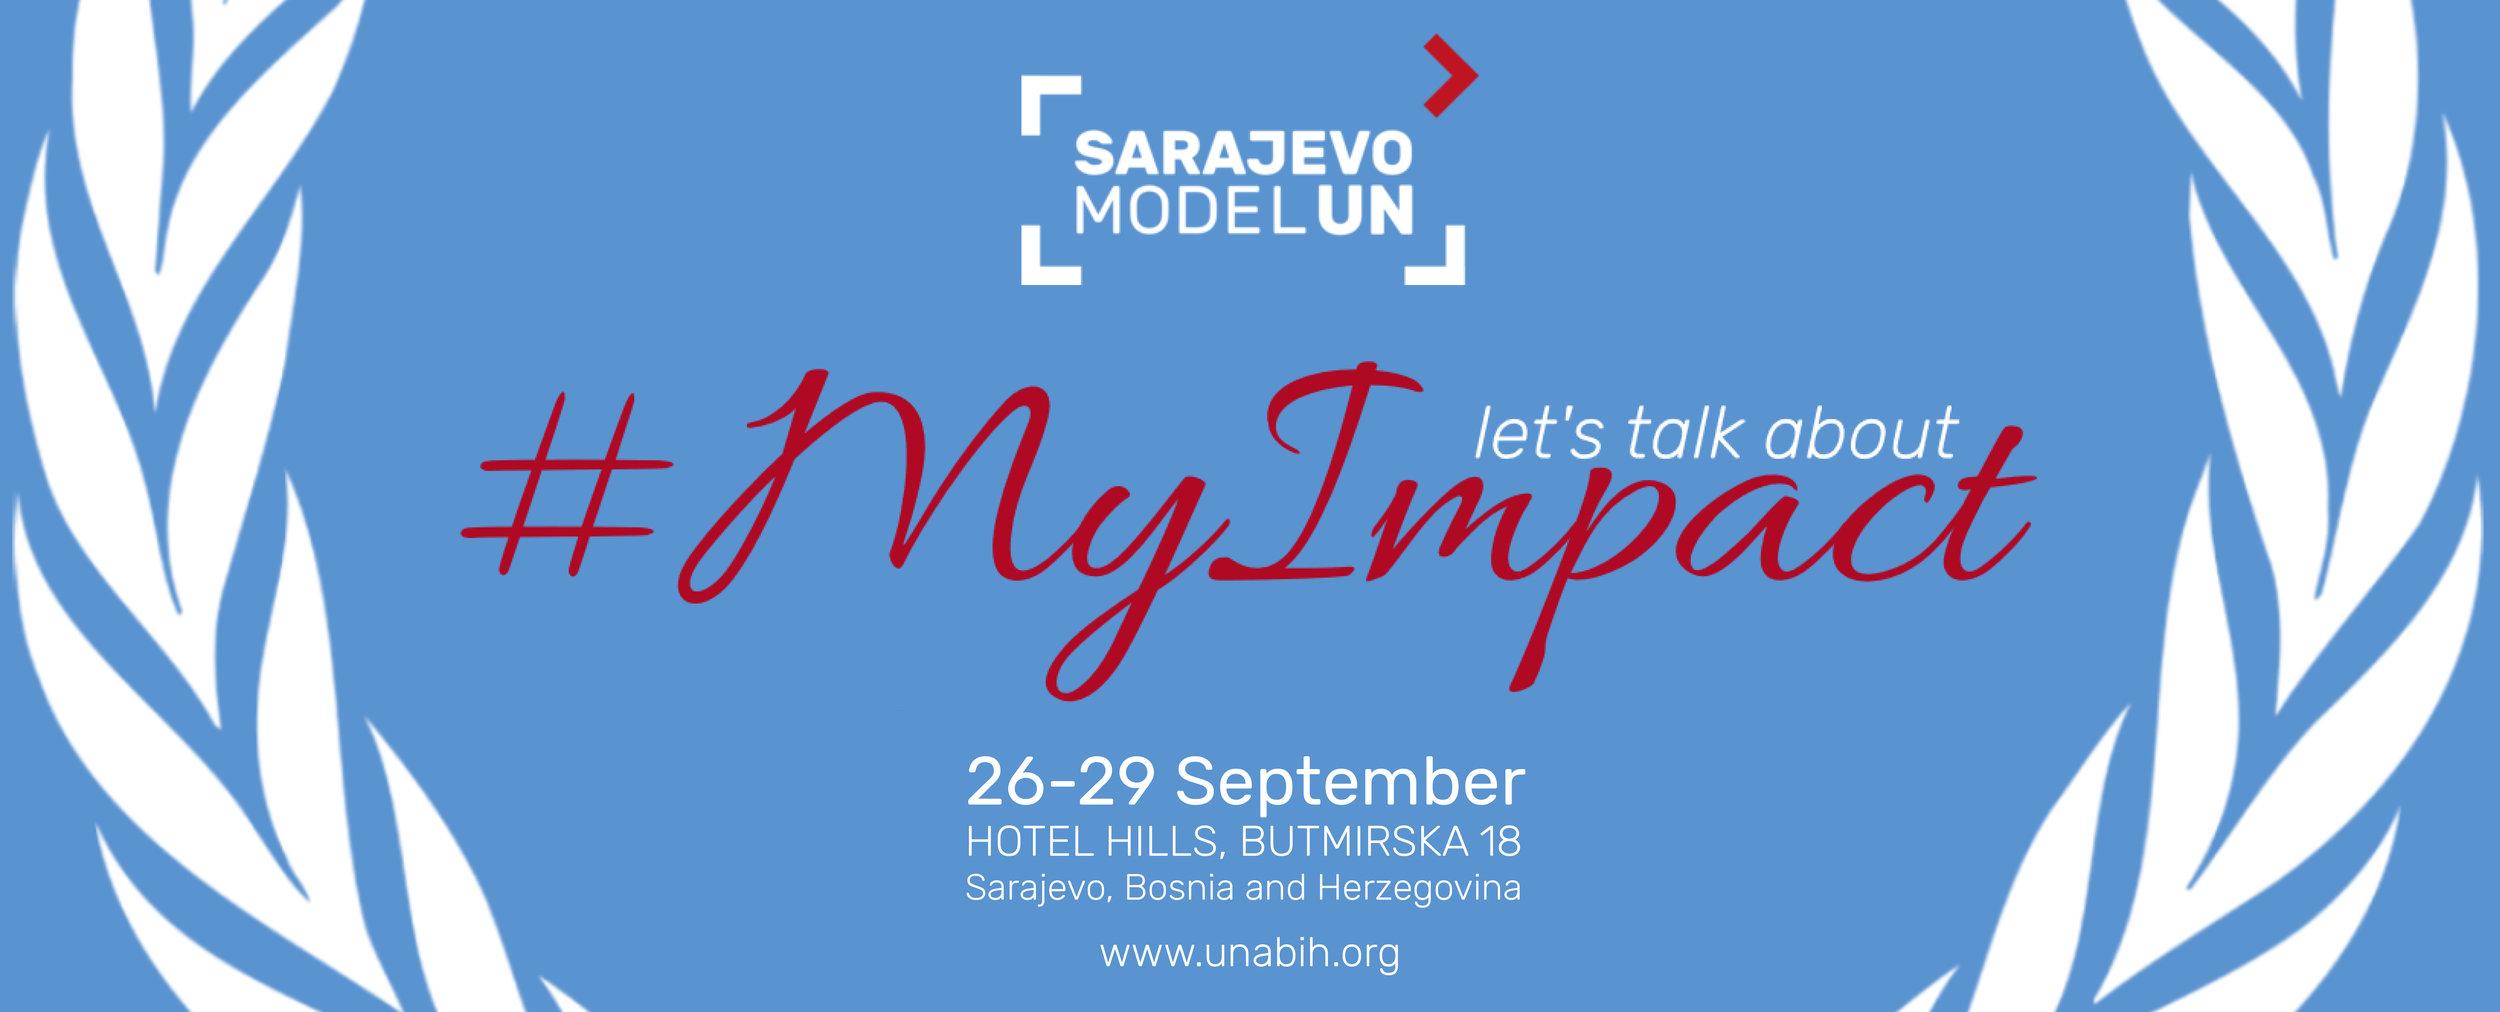 Sarajevo Model UN 2019 - My Impact